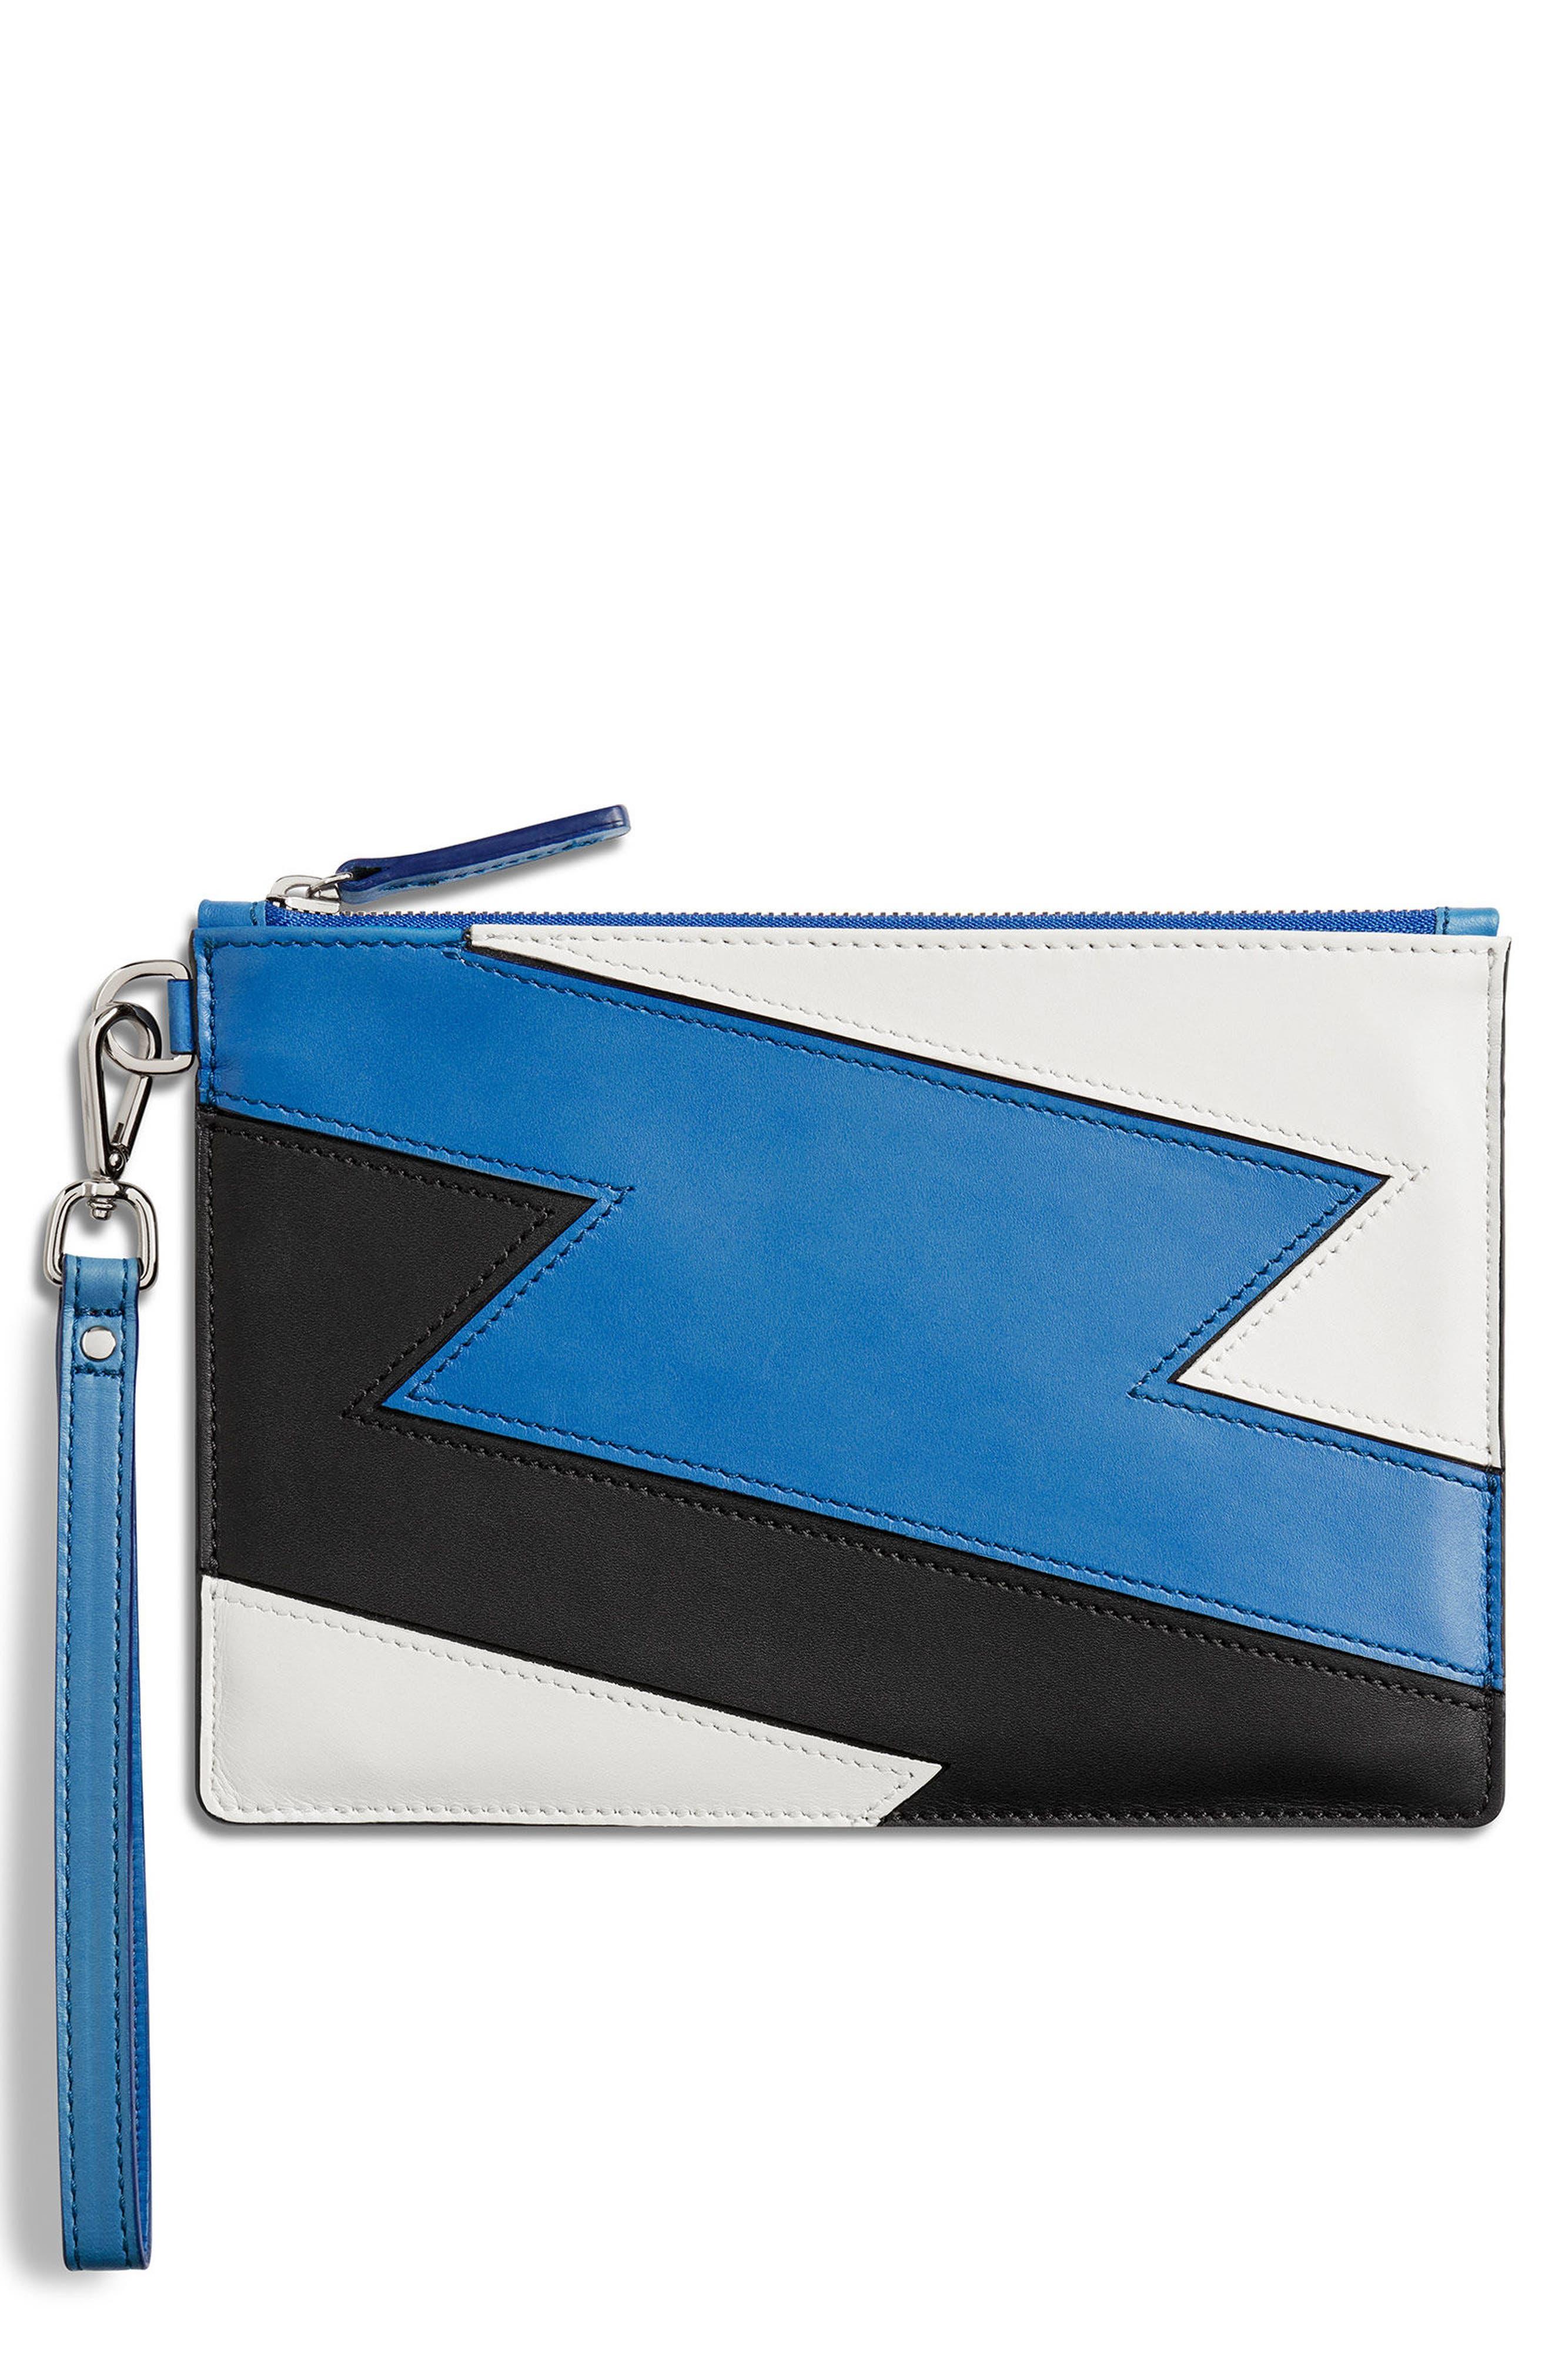 Bolt Nappa Leather Wristlet,                             Main thumbnail 1, color,                             427